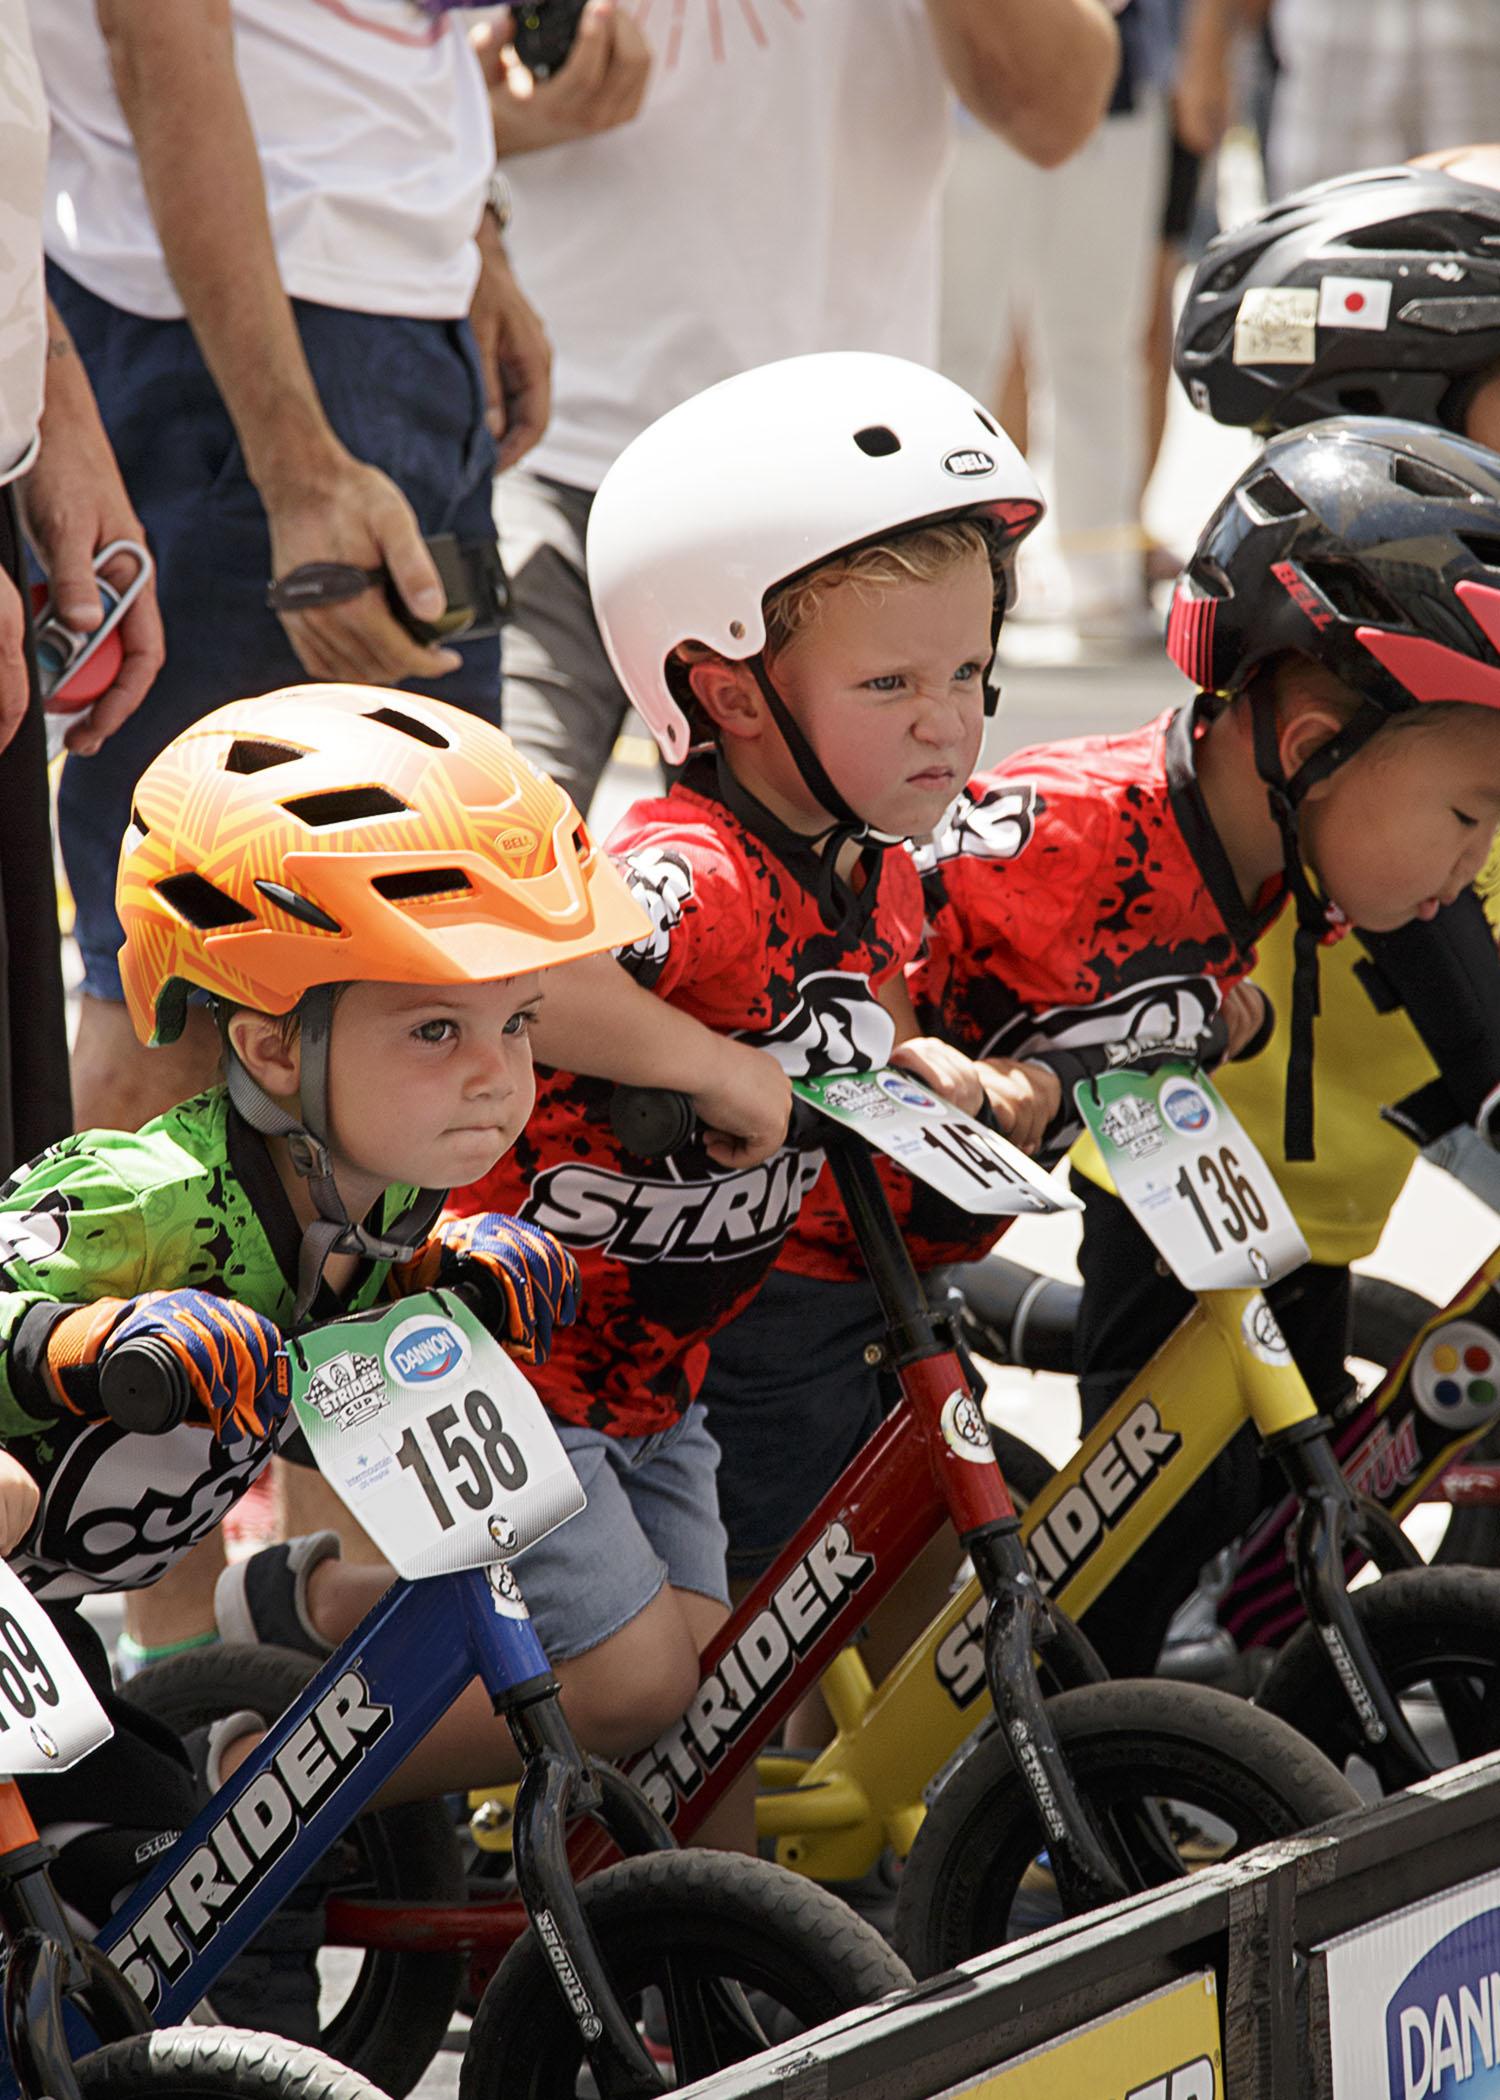 Boston's World Cup Strider Bike Race